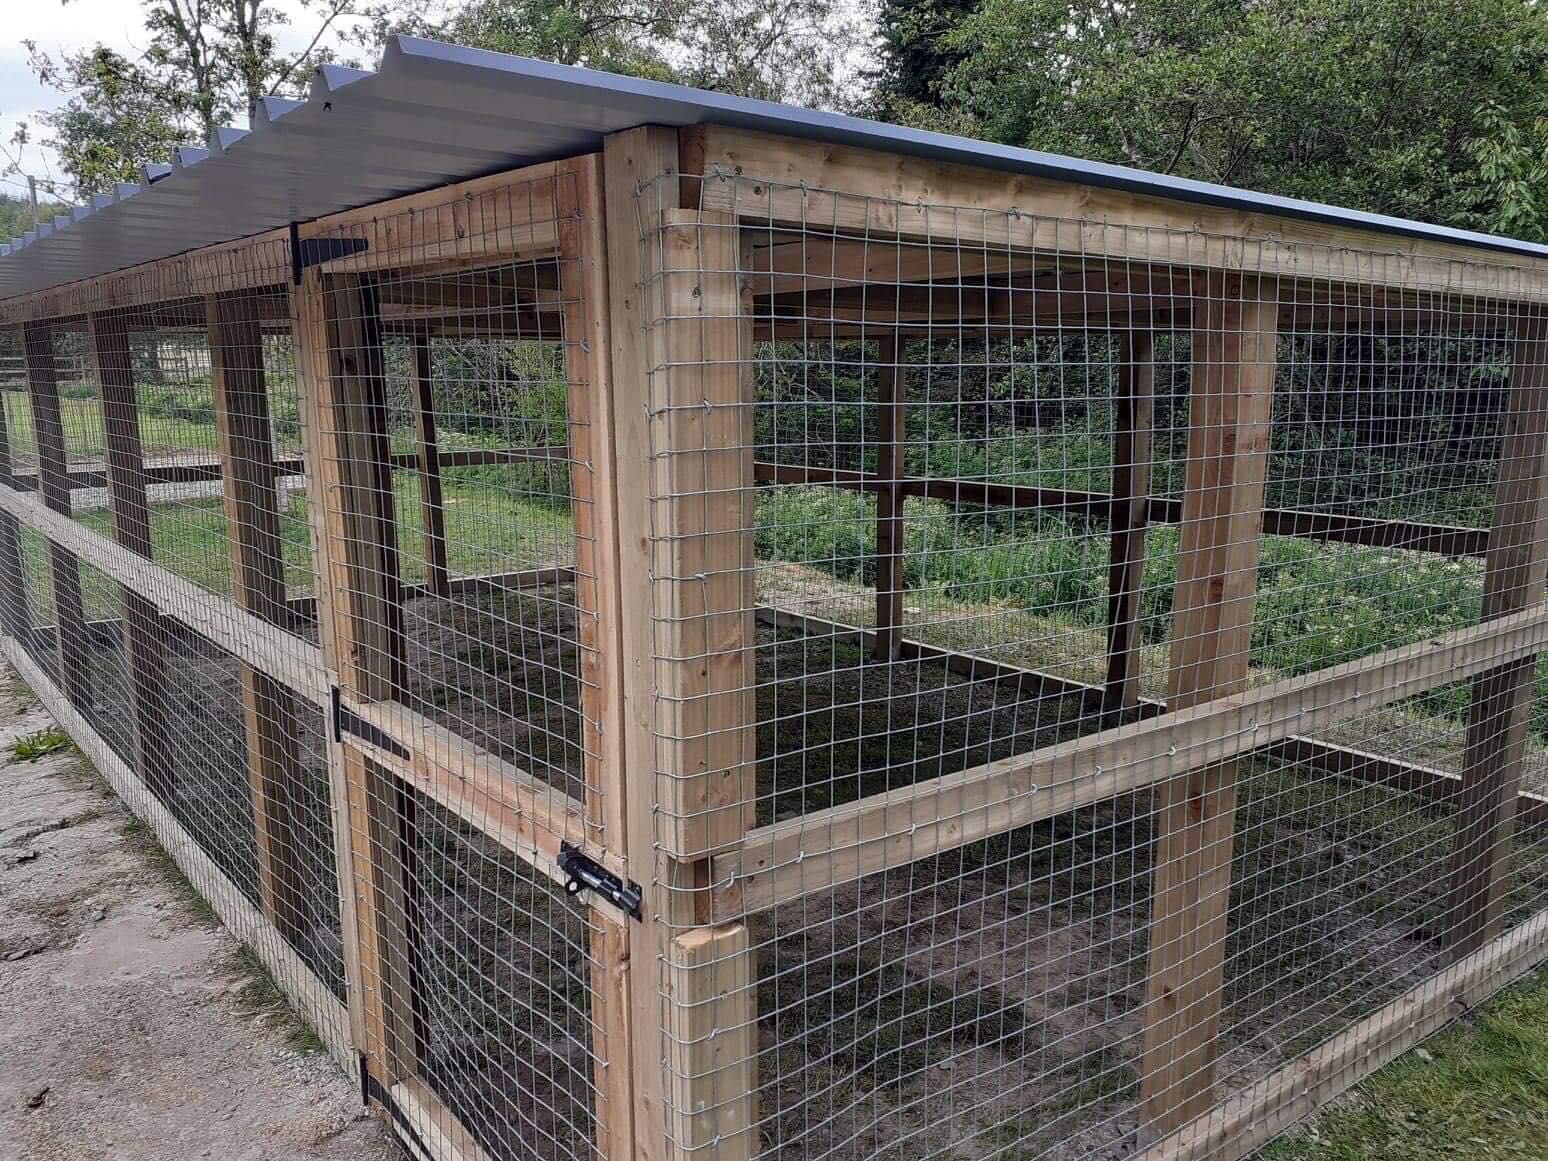 Kennel enclosure